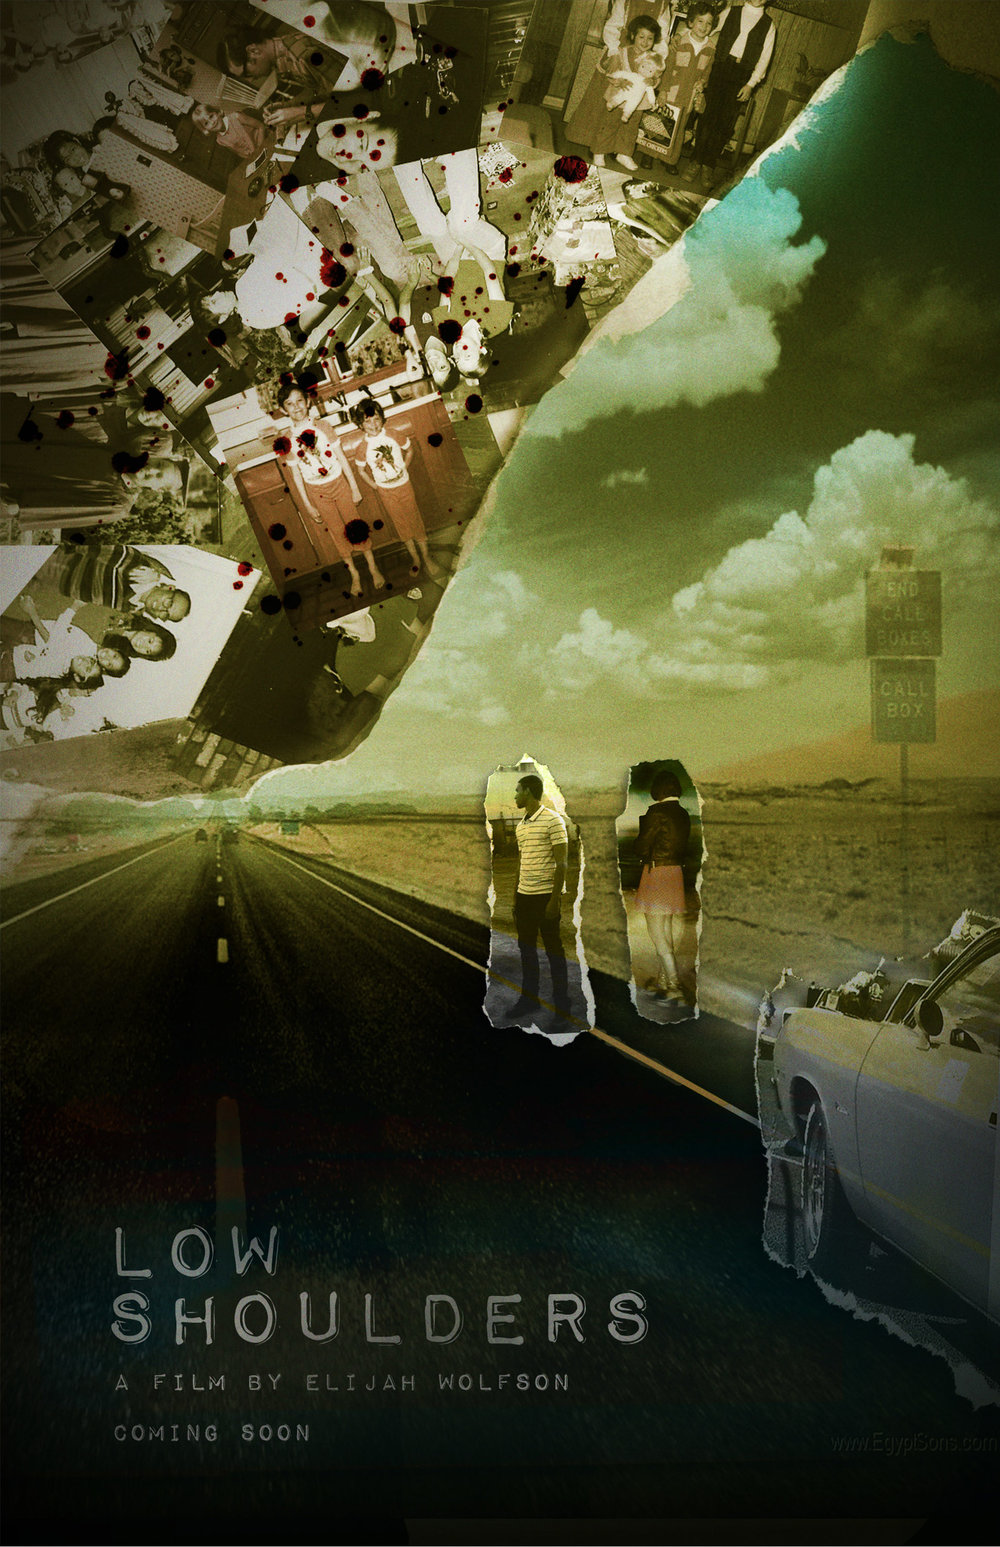 Short film poster design